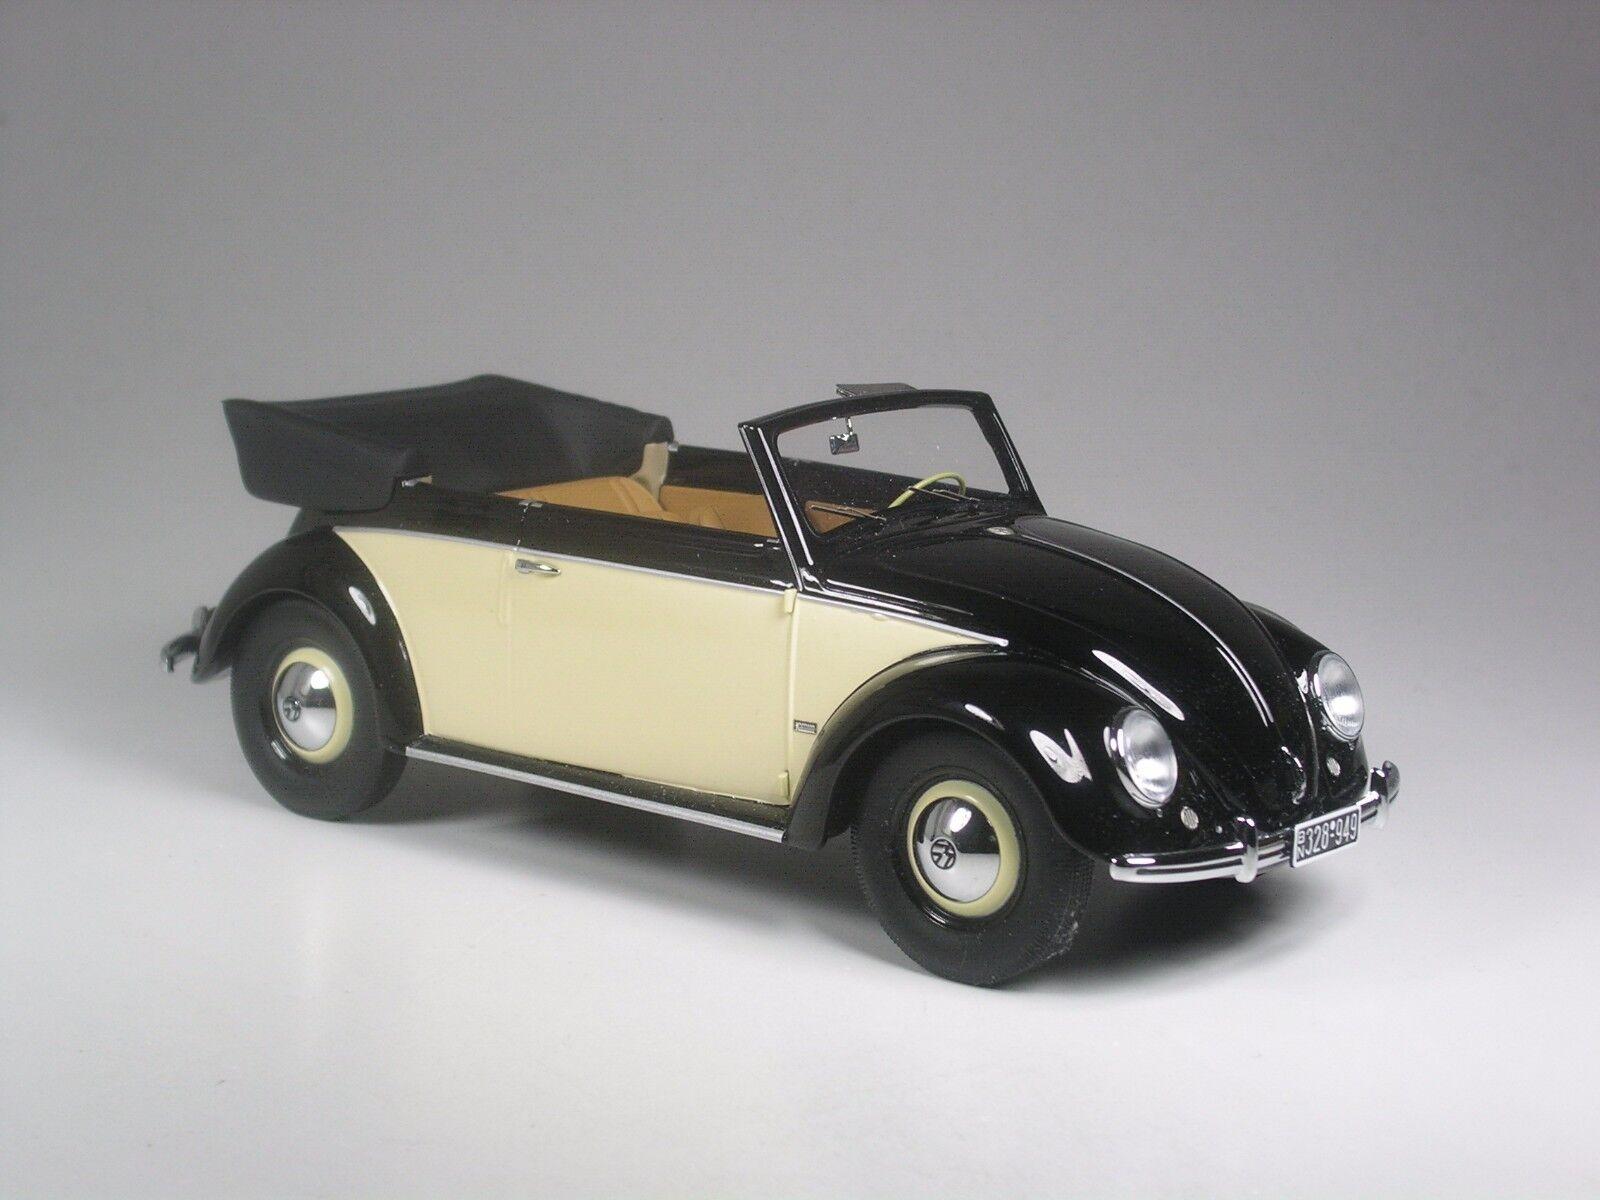 Klasse  Minichamps VW 1200 Käfer Cabrio schwarz-creme in 1 18 in OVP